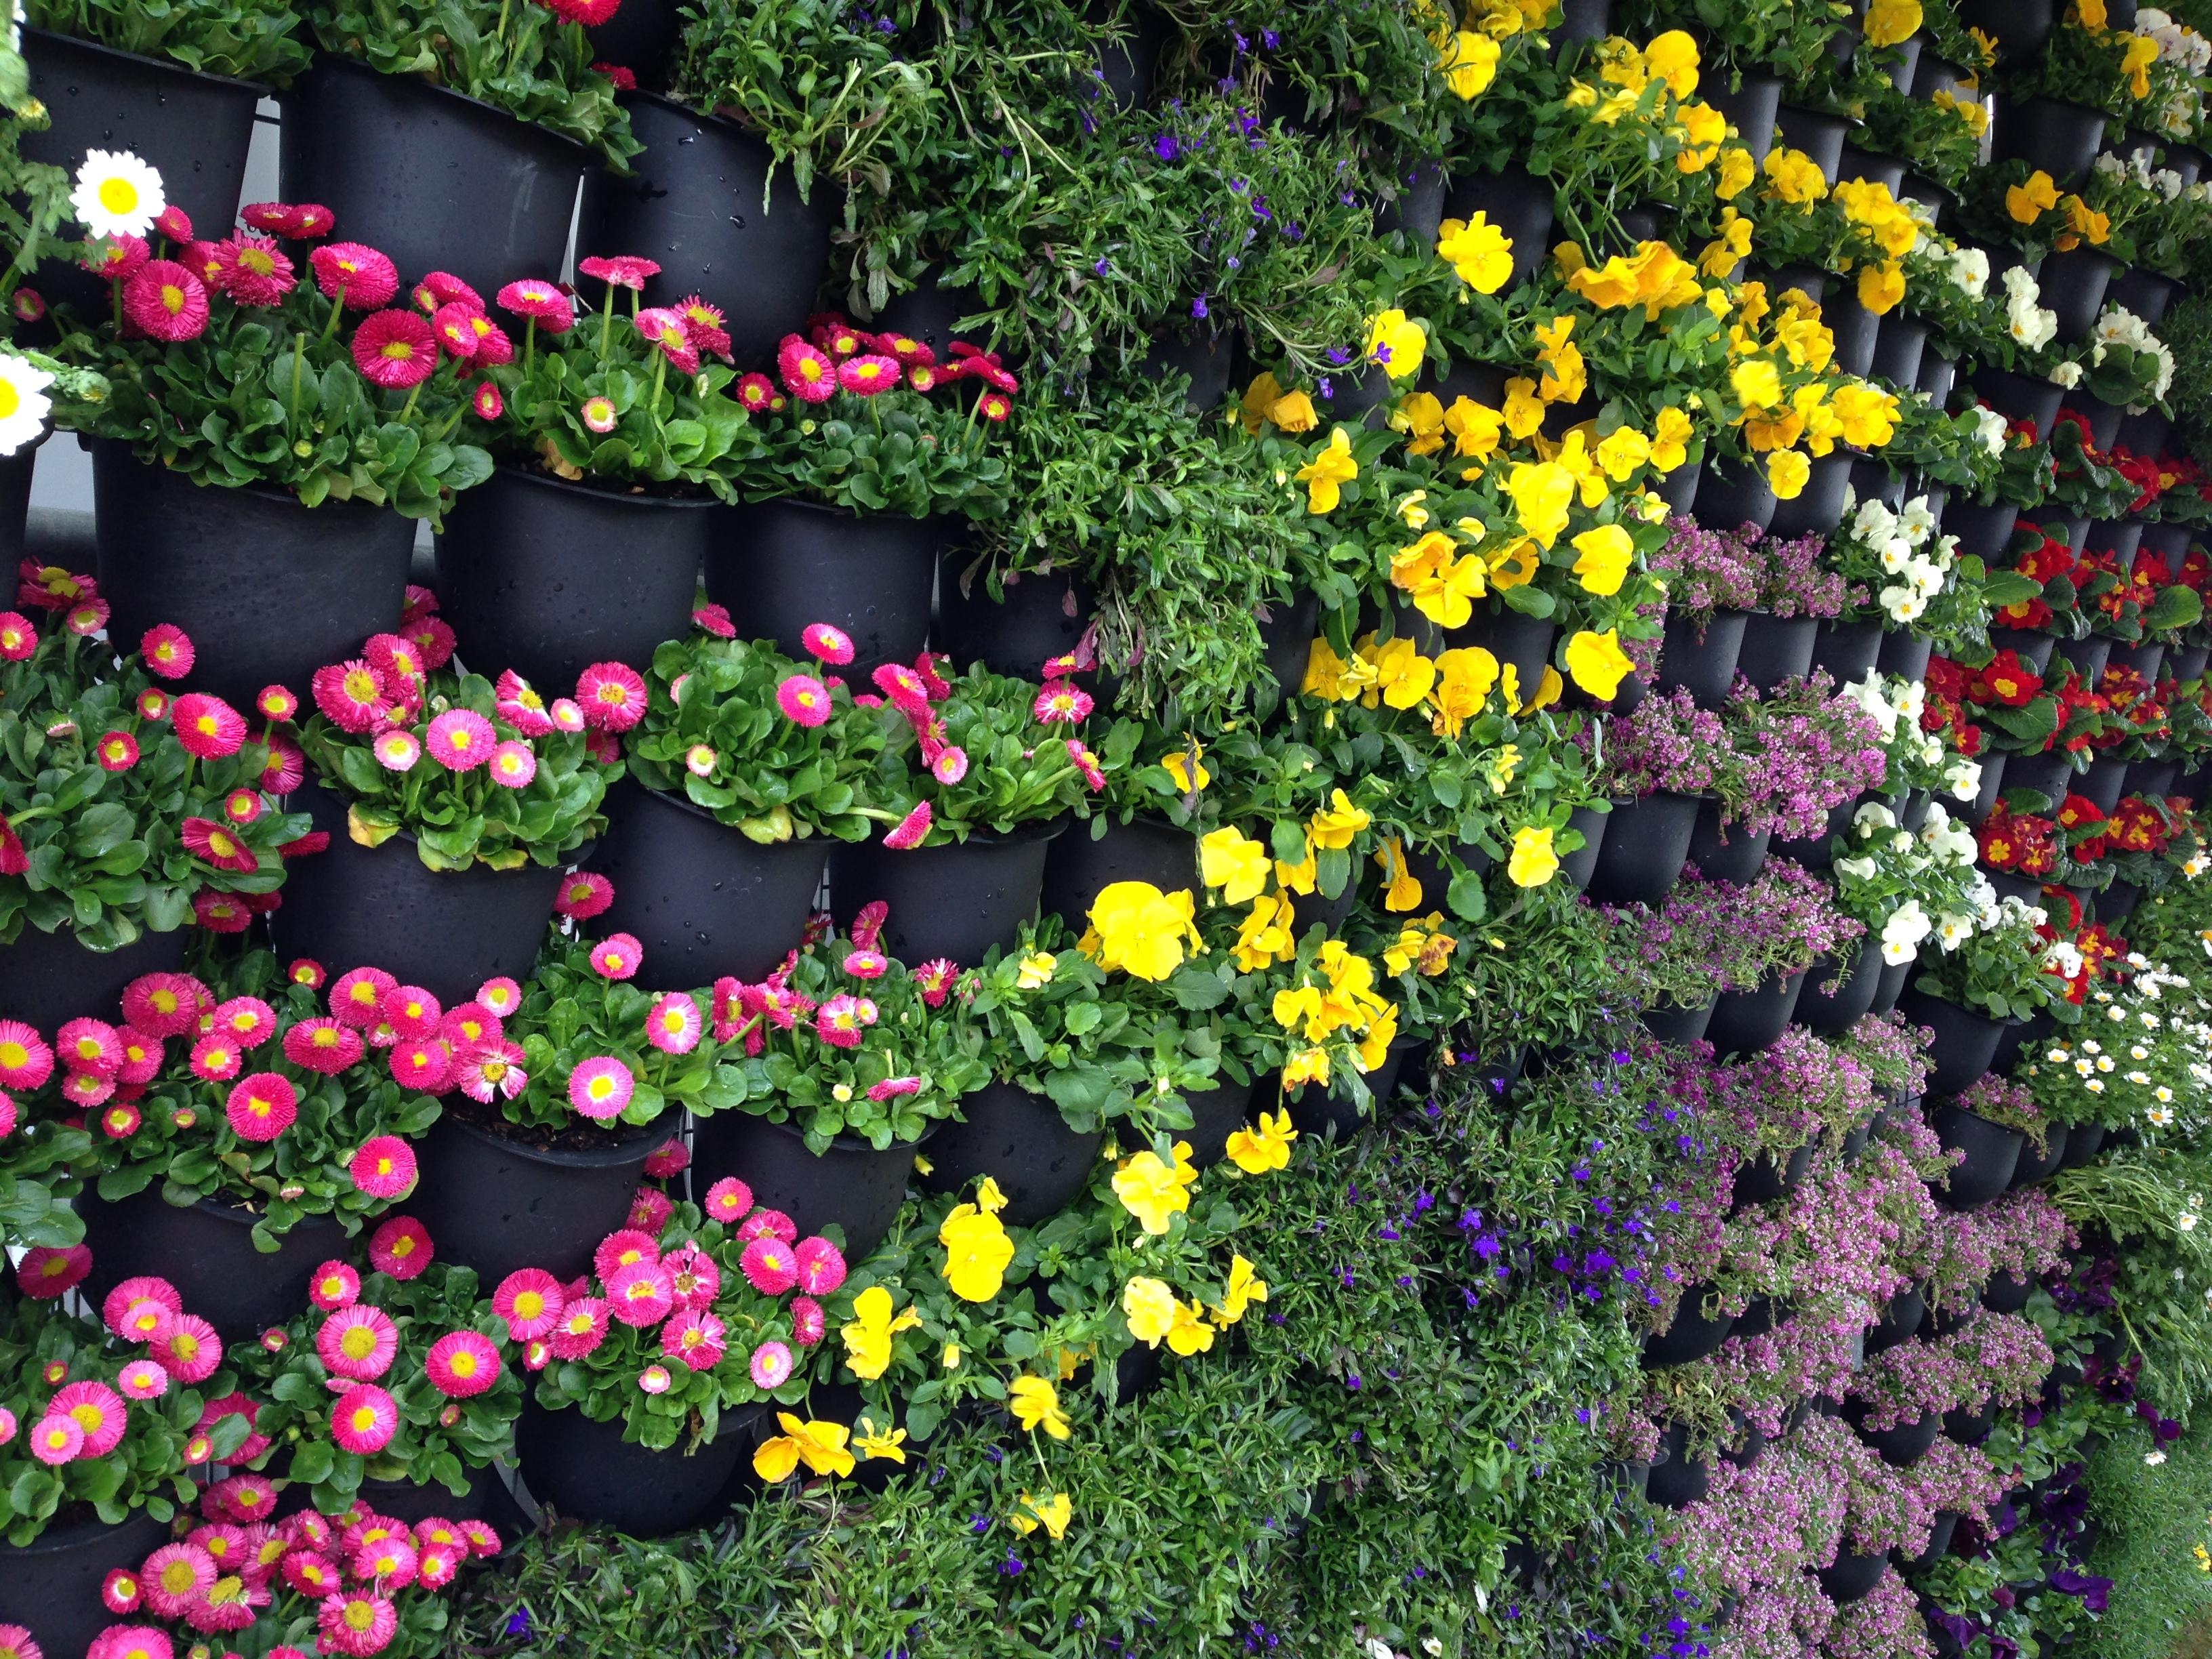 Top 10 DIY Vertical Garden Ideas That You Will Find Helpful